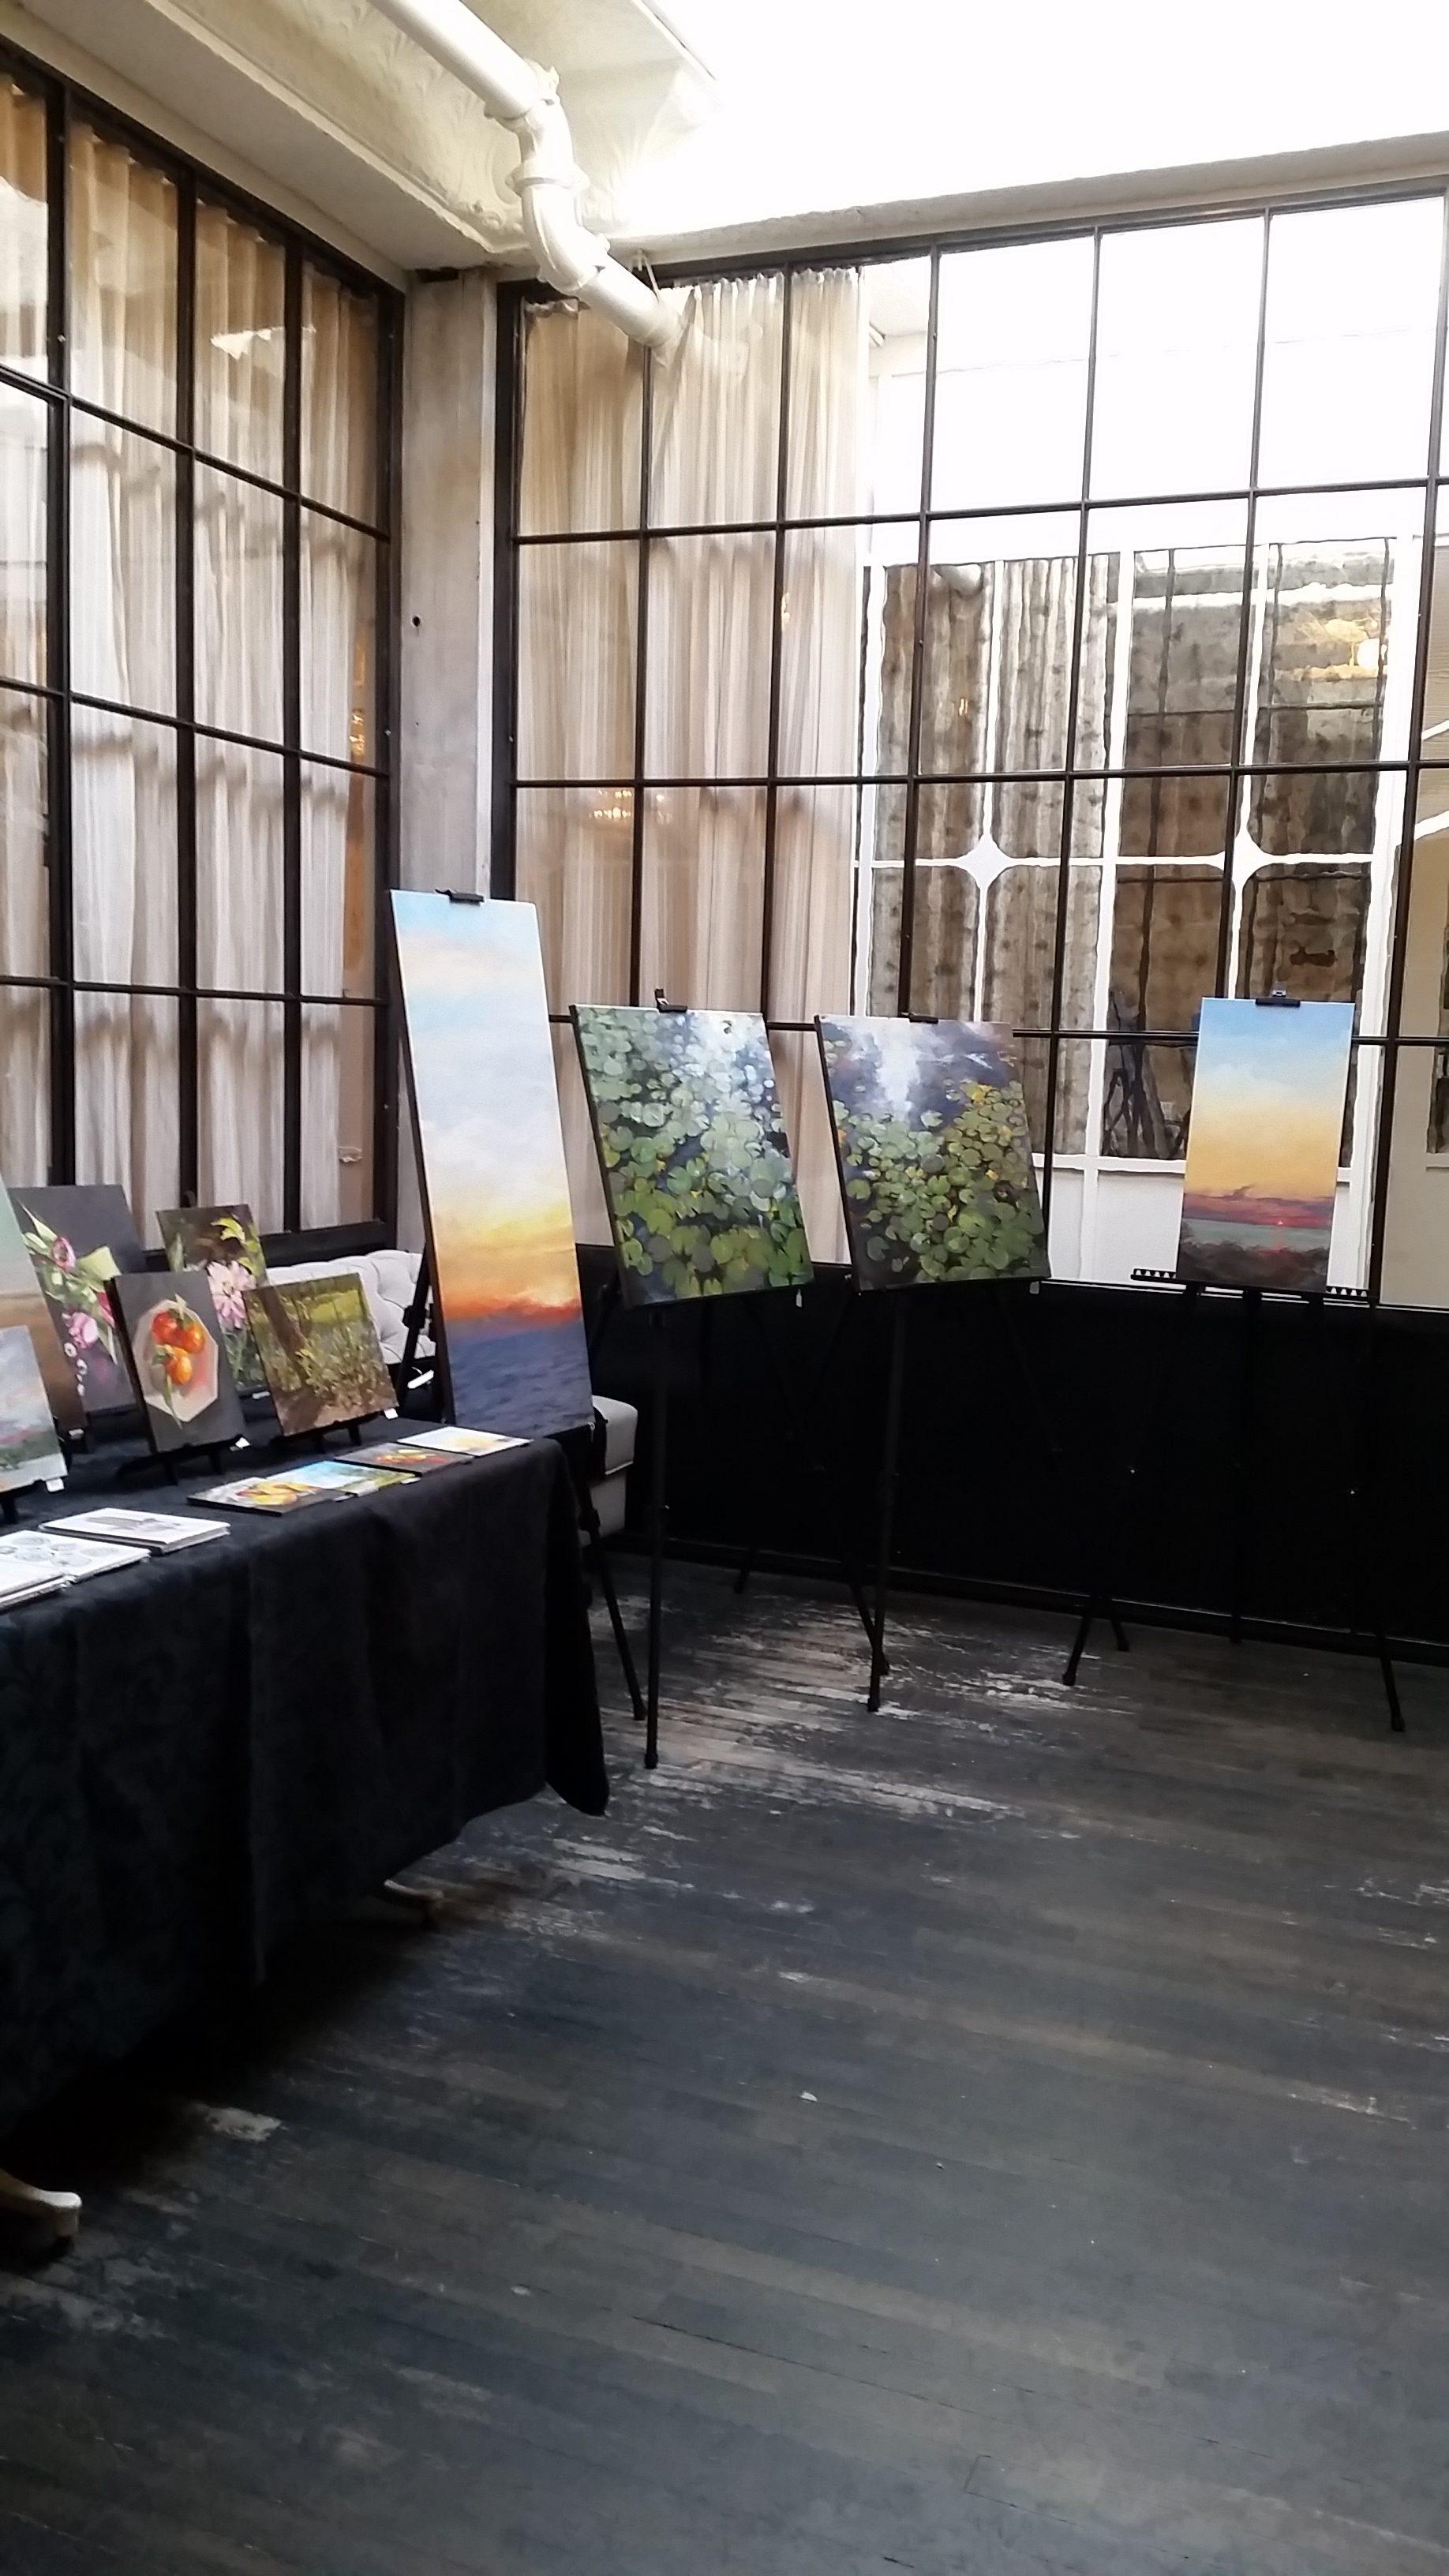 Art show photo